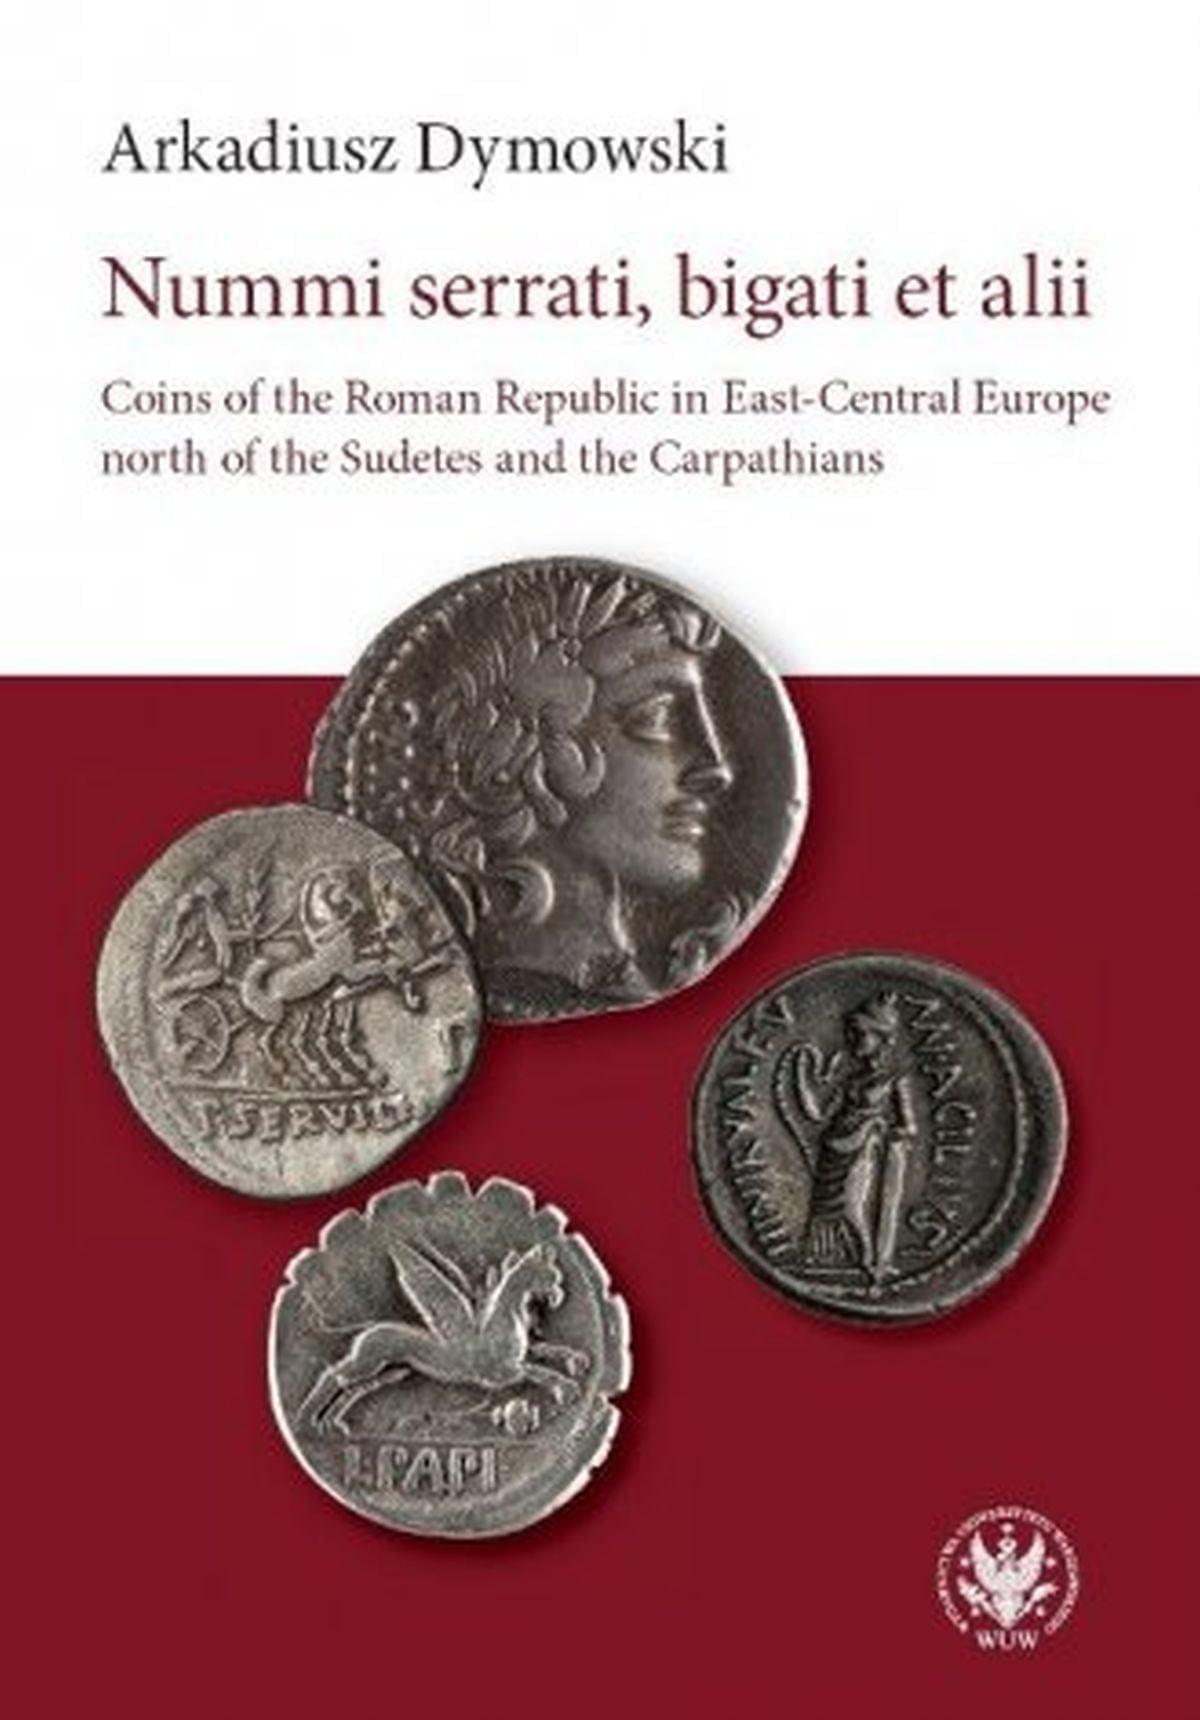 Nummi serrati, bigati et alii. Coins of the Roman Republic in East-Central Europe